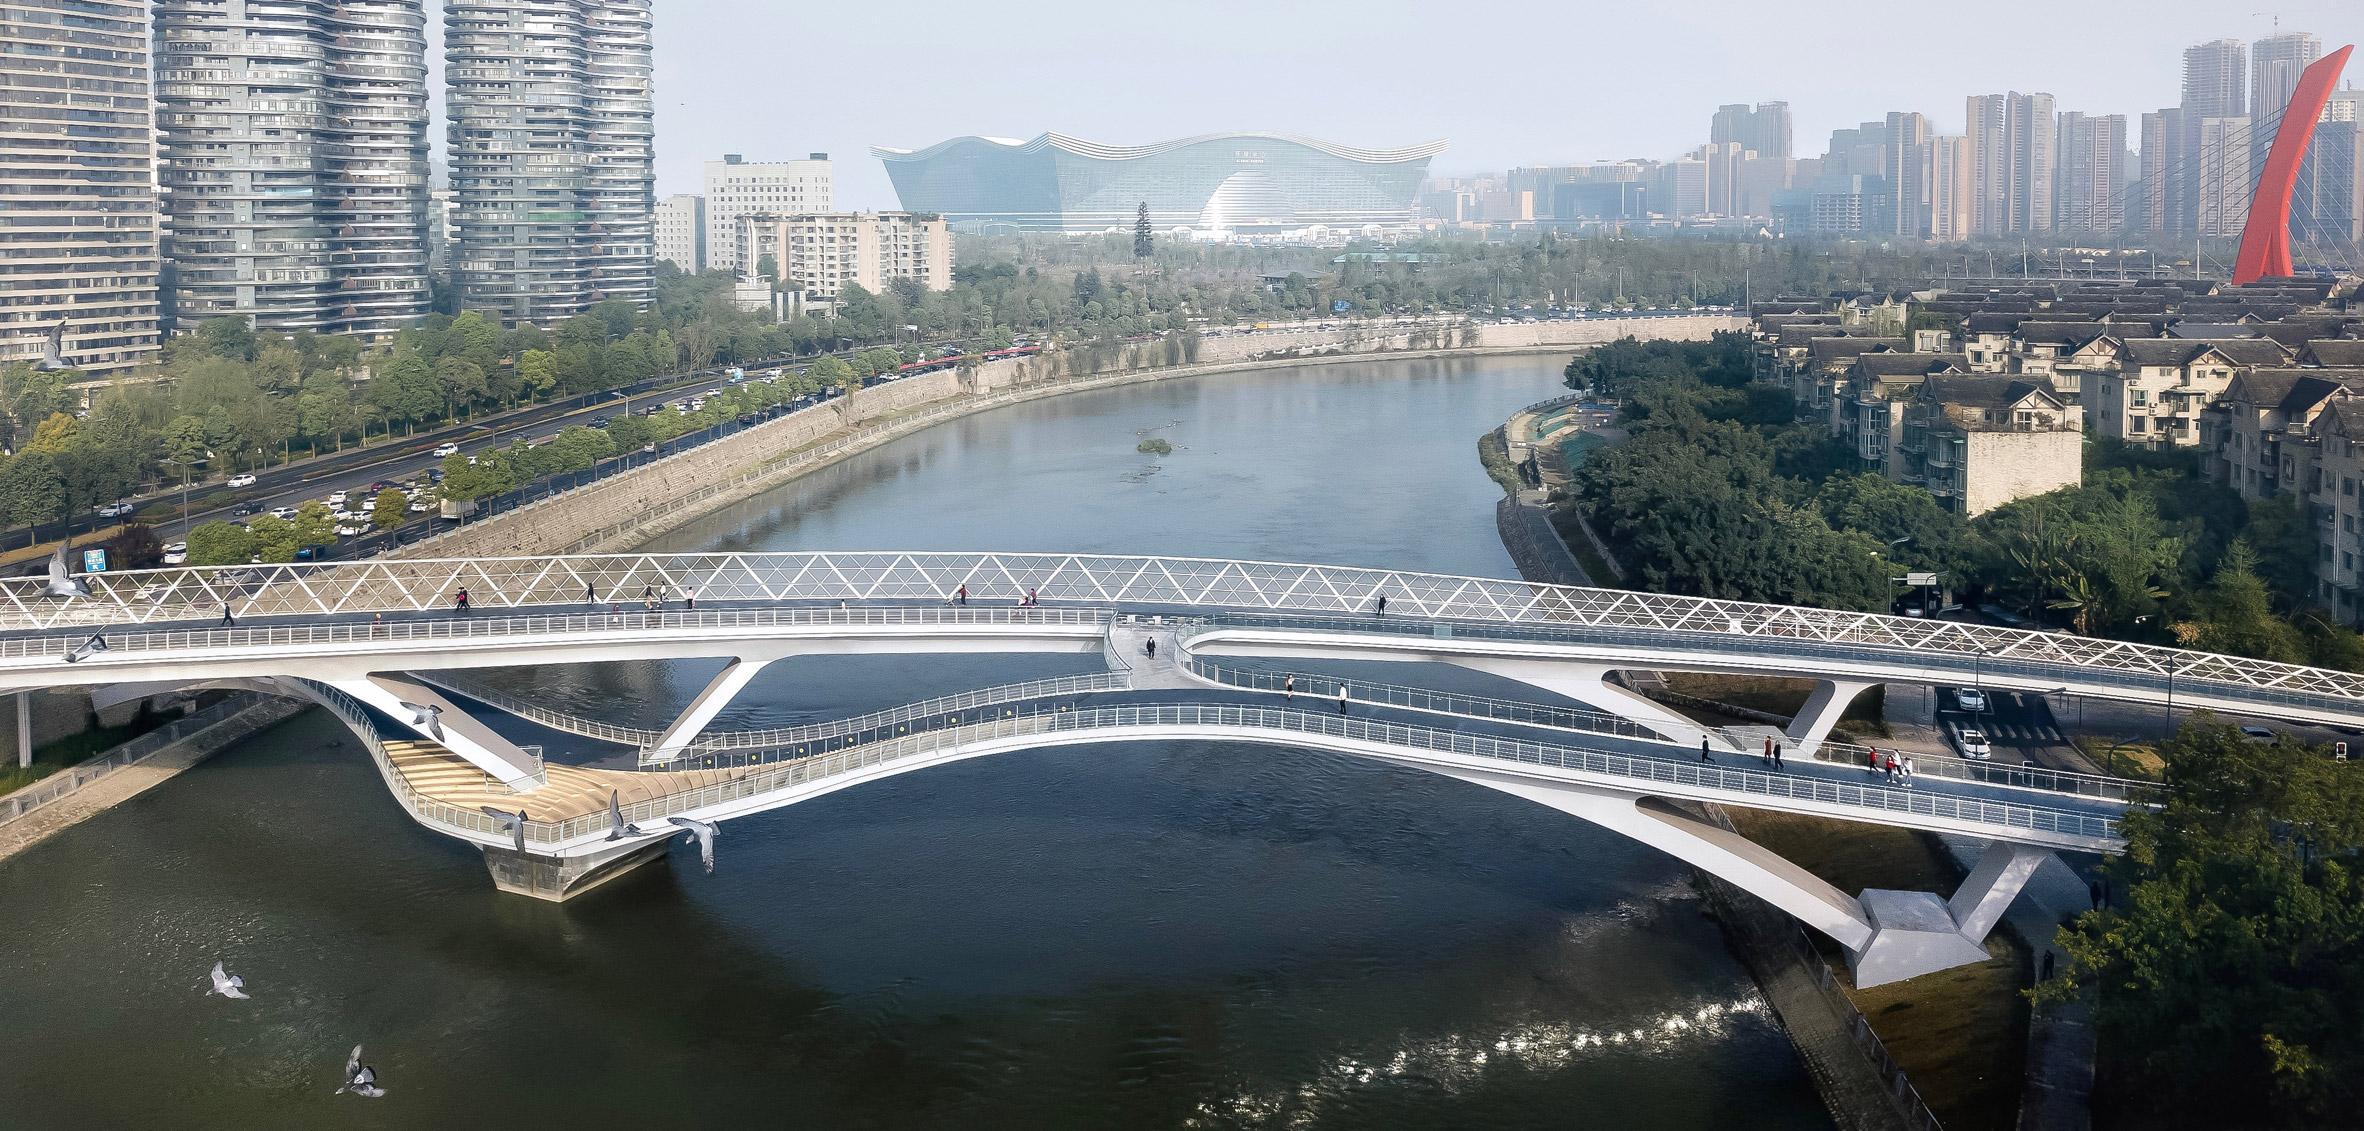 Wuchazi Bridge in Chengdu by architects Tom Wünschmann, Achim Kaufer, Wei Cai and Philipp Buschmeyer and Chinese design institutes SADI and JDTM